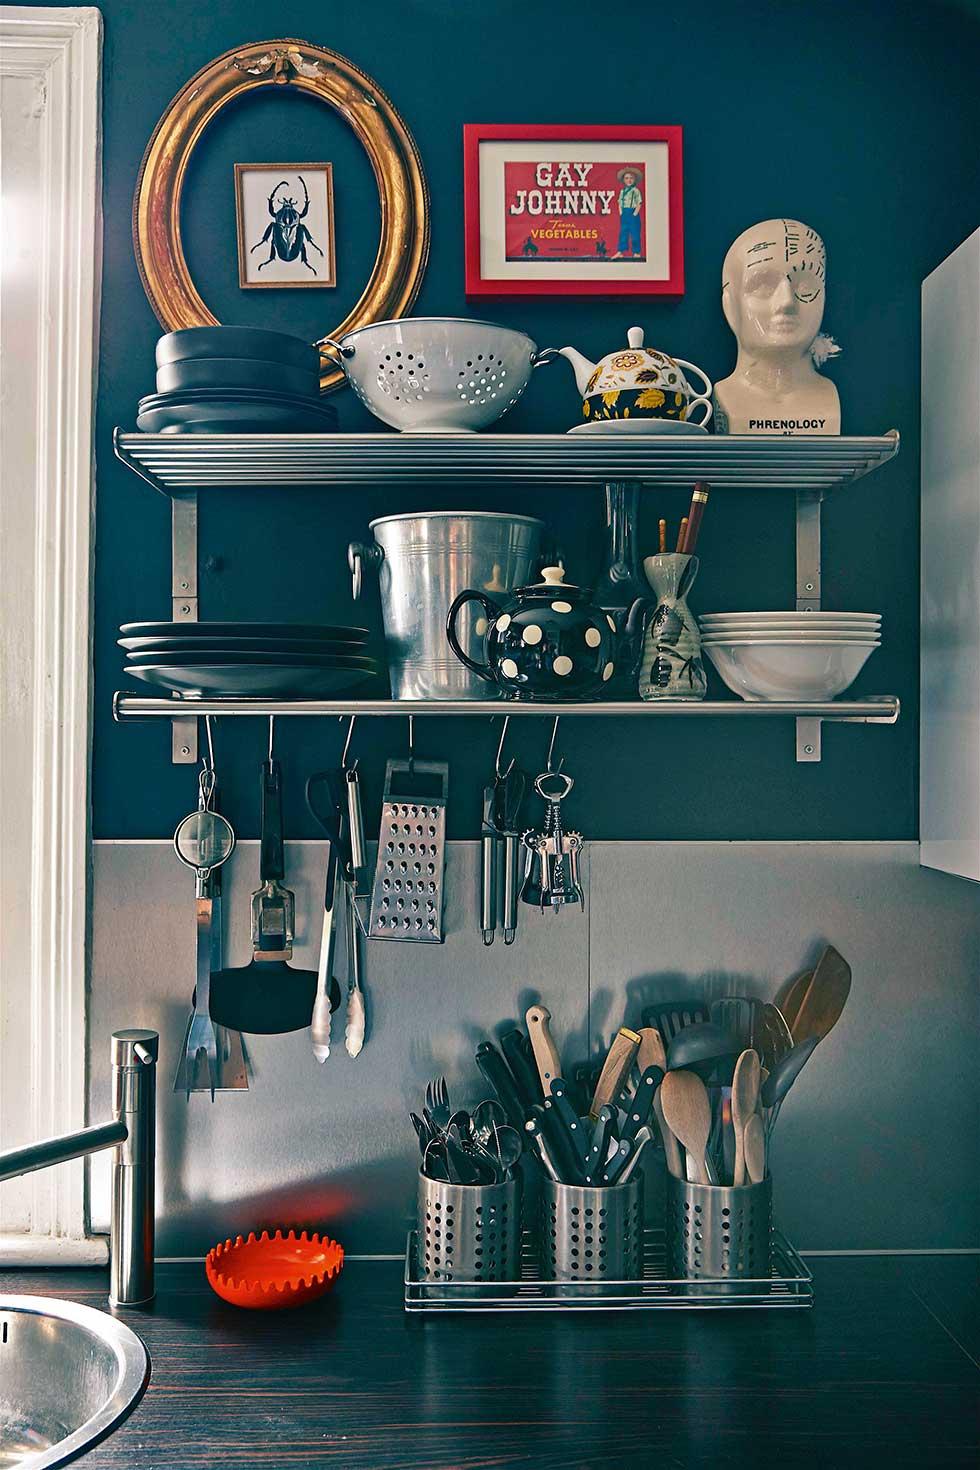 Duplex apartment kitchen utensils on shelves